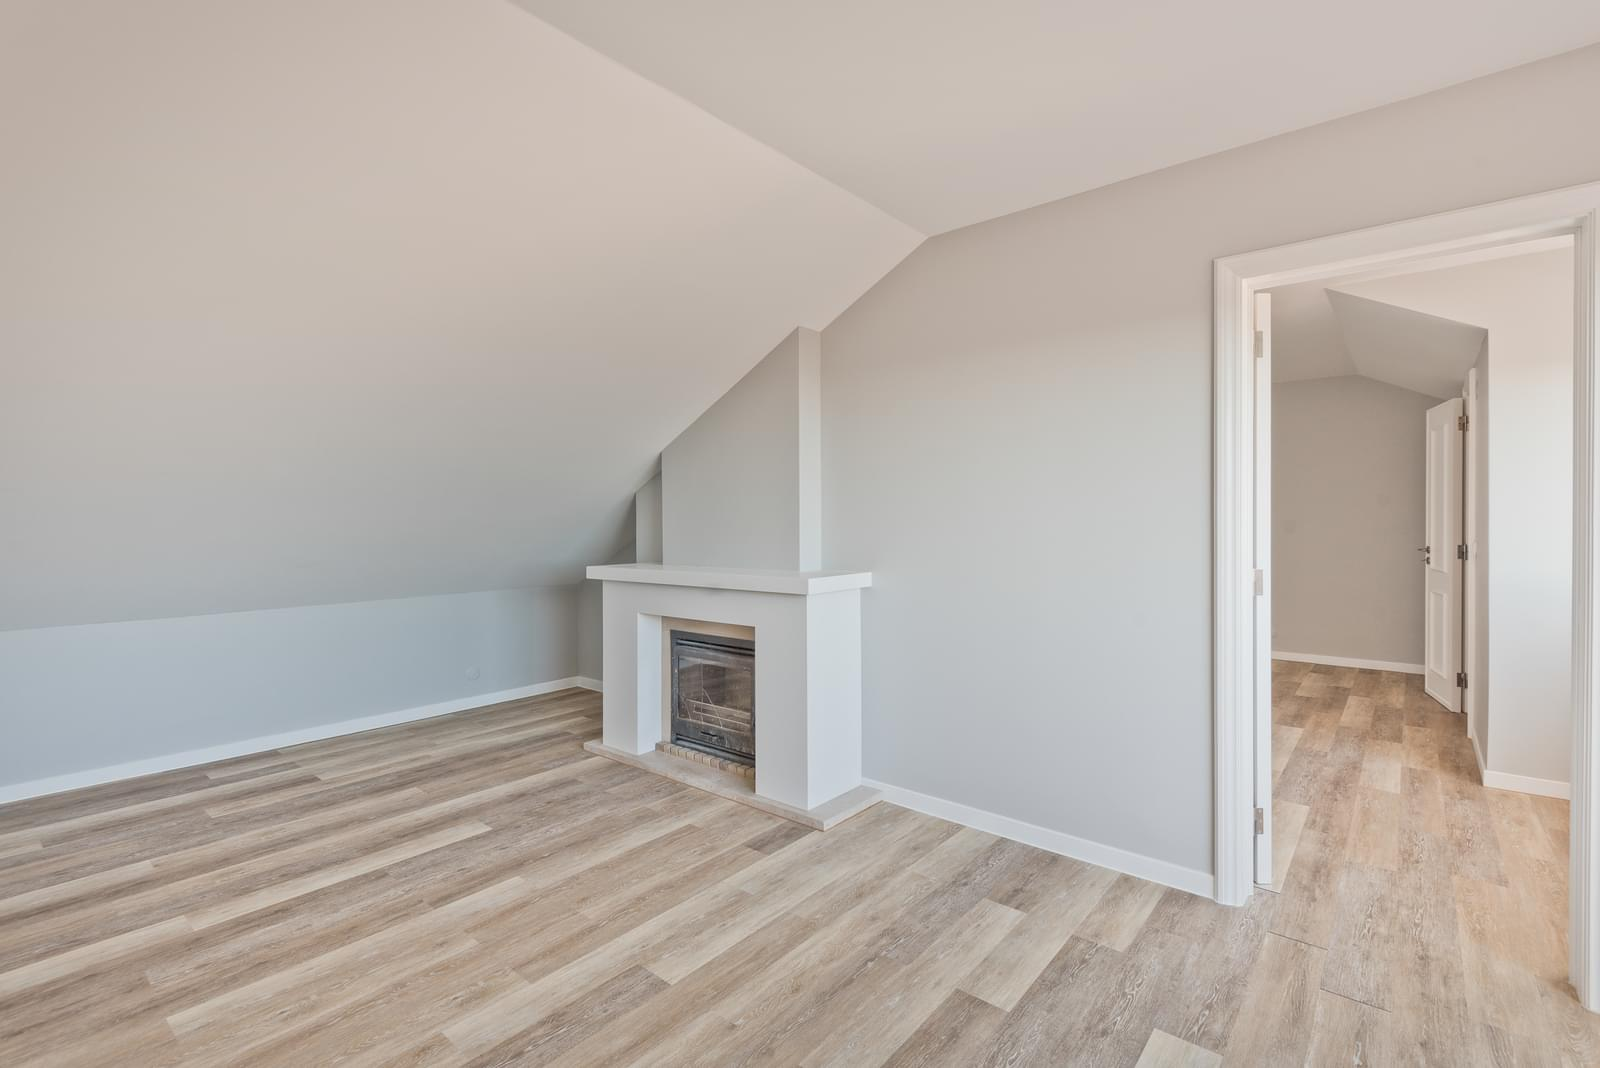 pf18956-apartamento-t3-1-cascais-3069e750-2ca6-4b6e-b069-b8d13a81cd7c